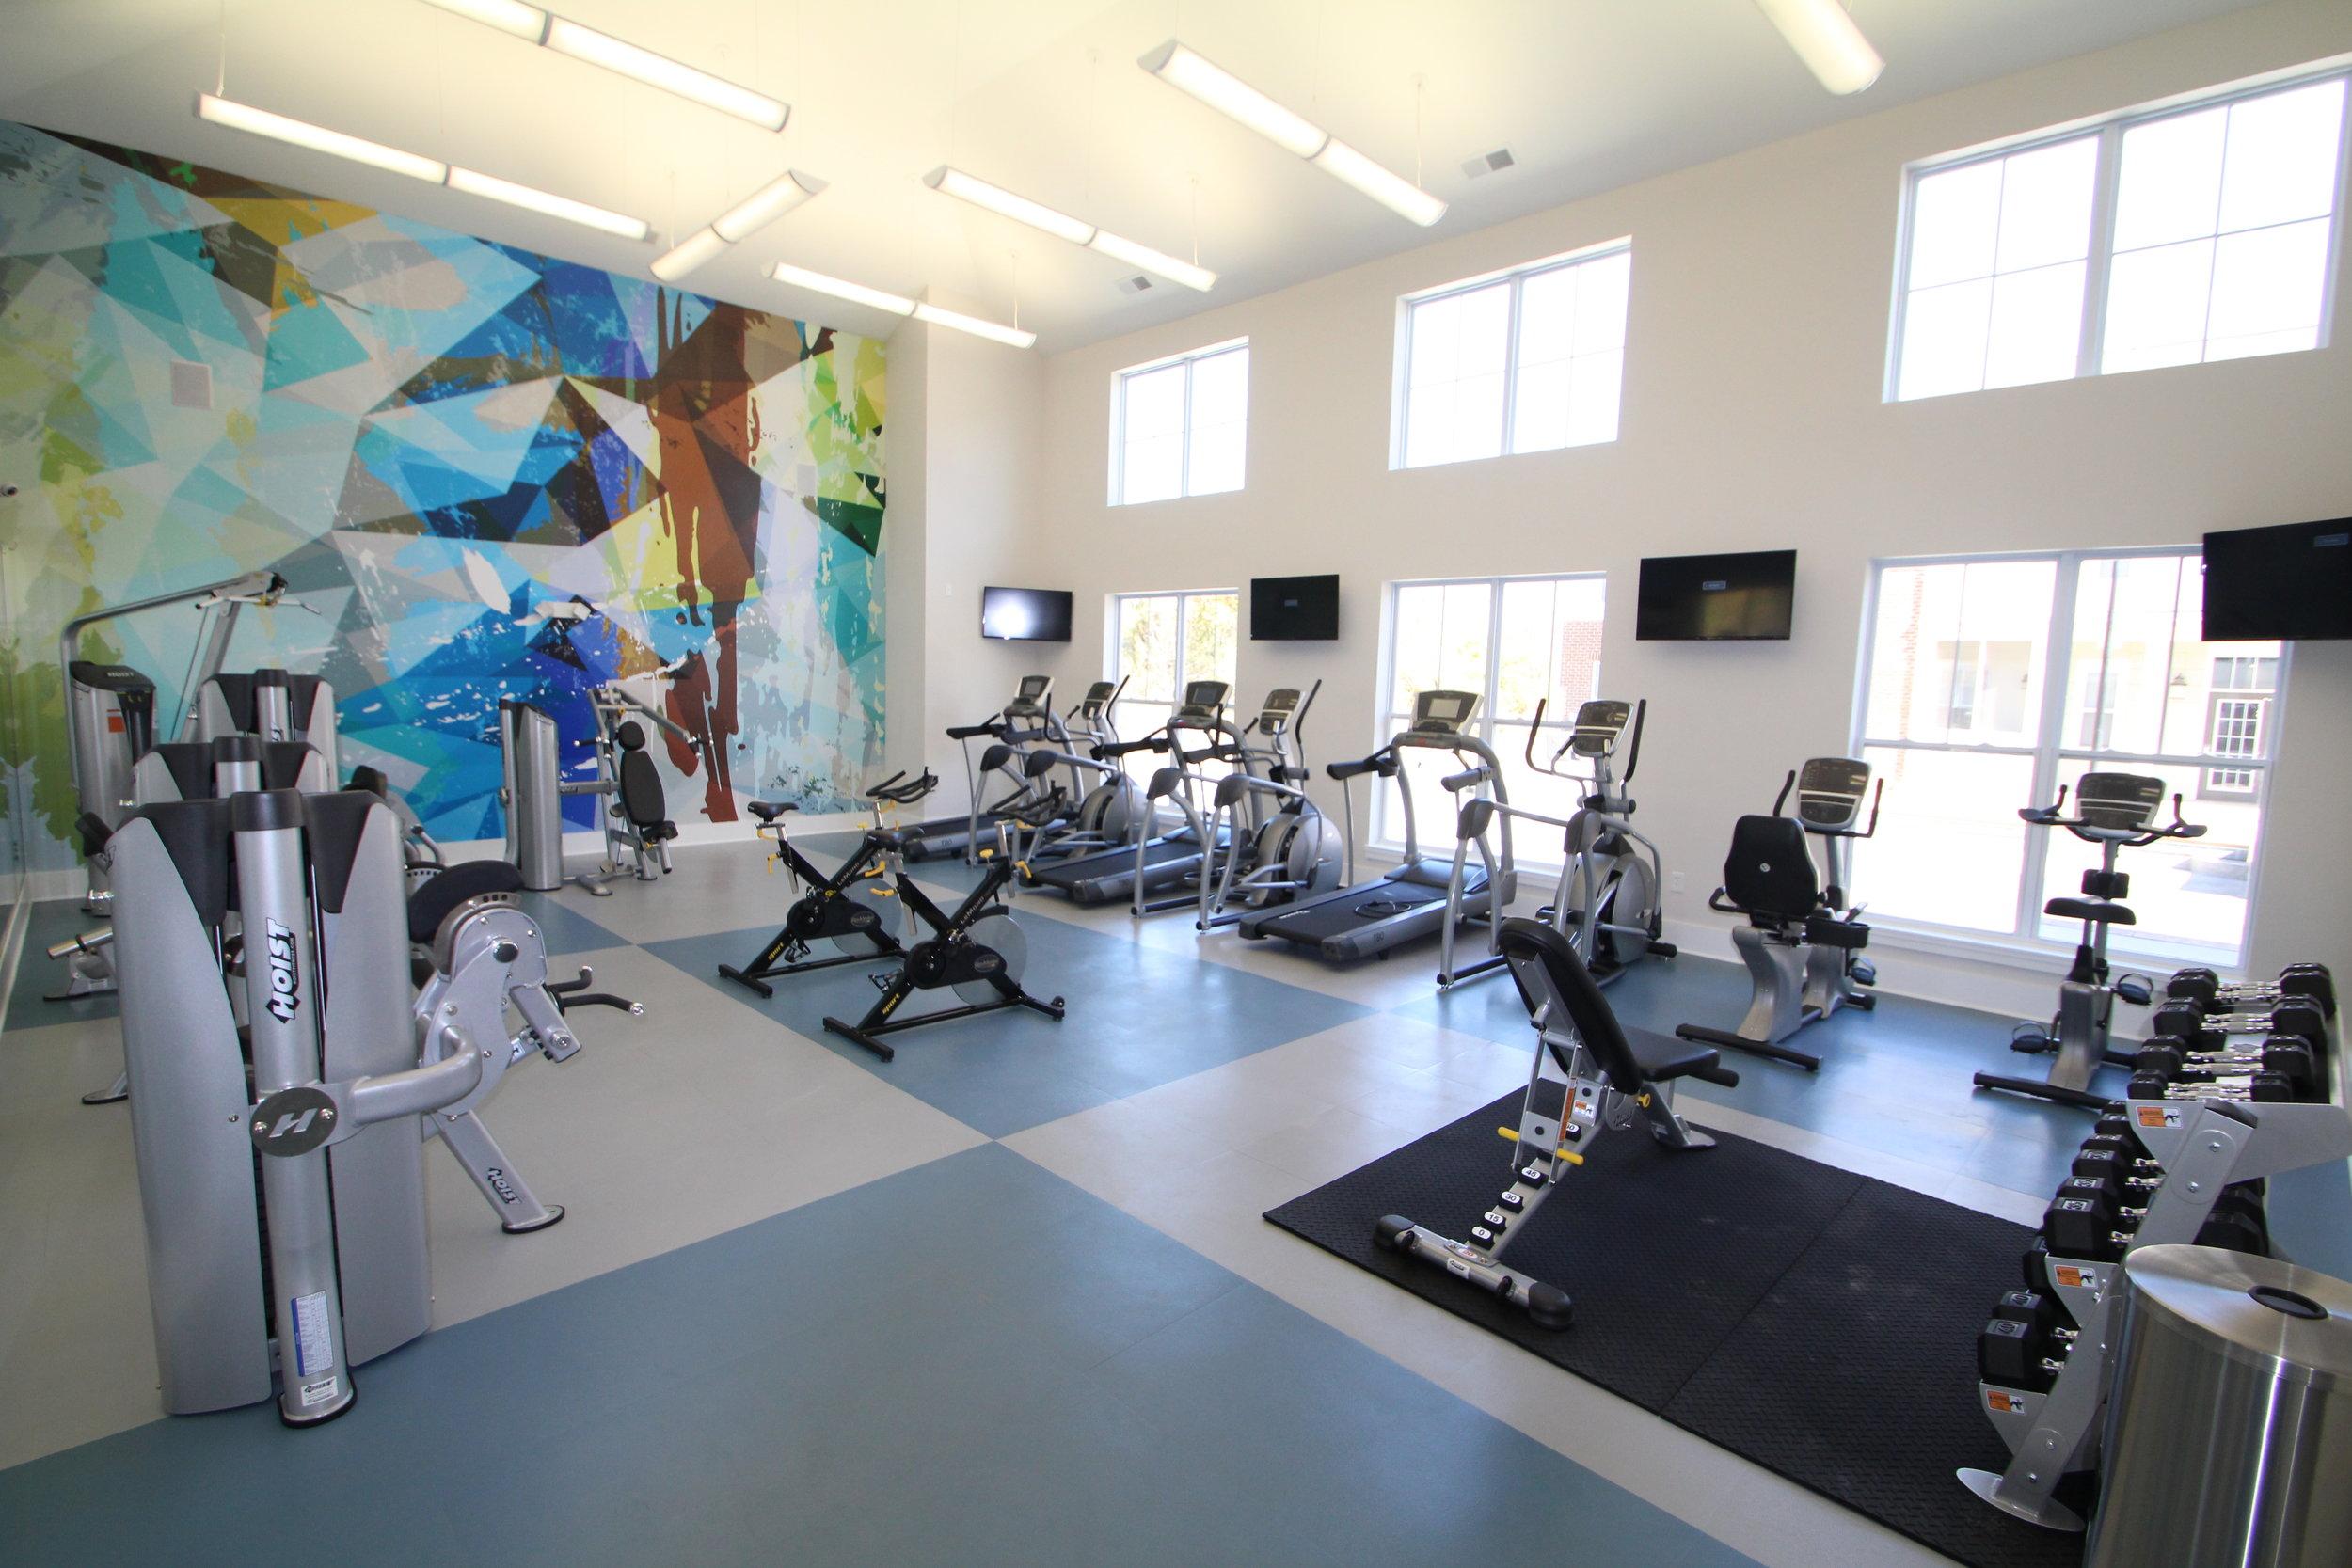 Highpointe - Workout facility 1 (amenities).JPG